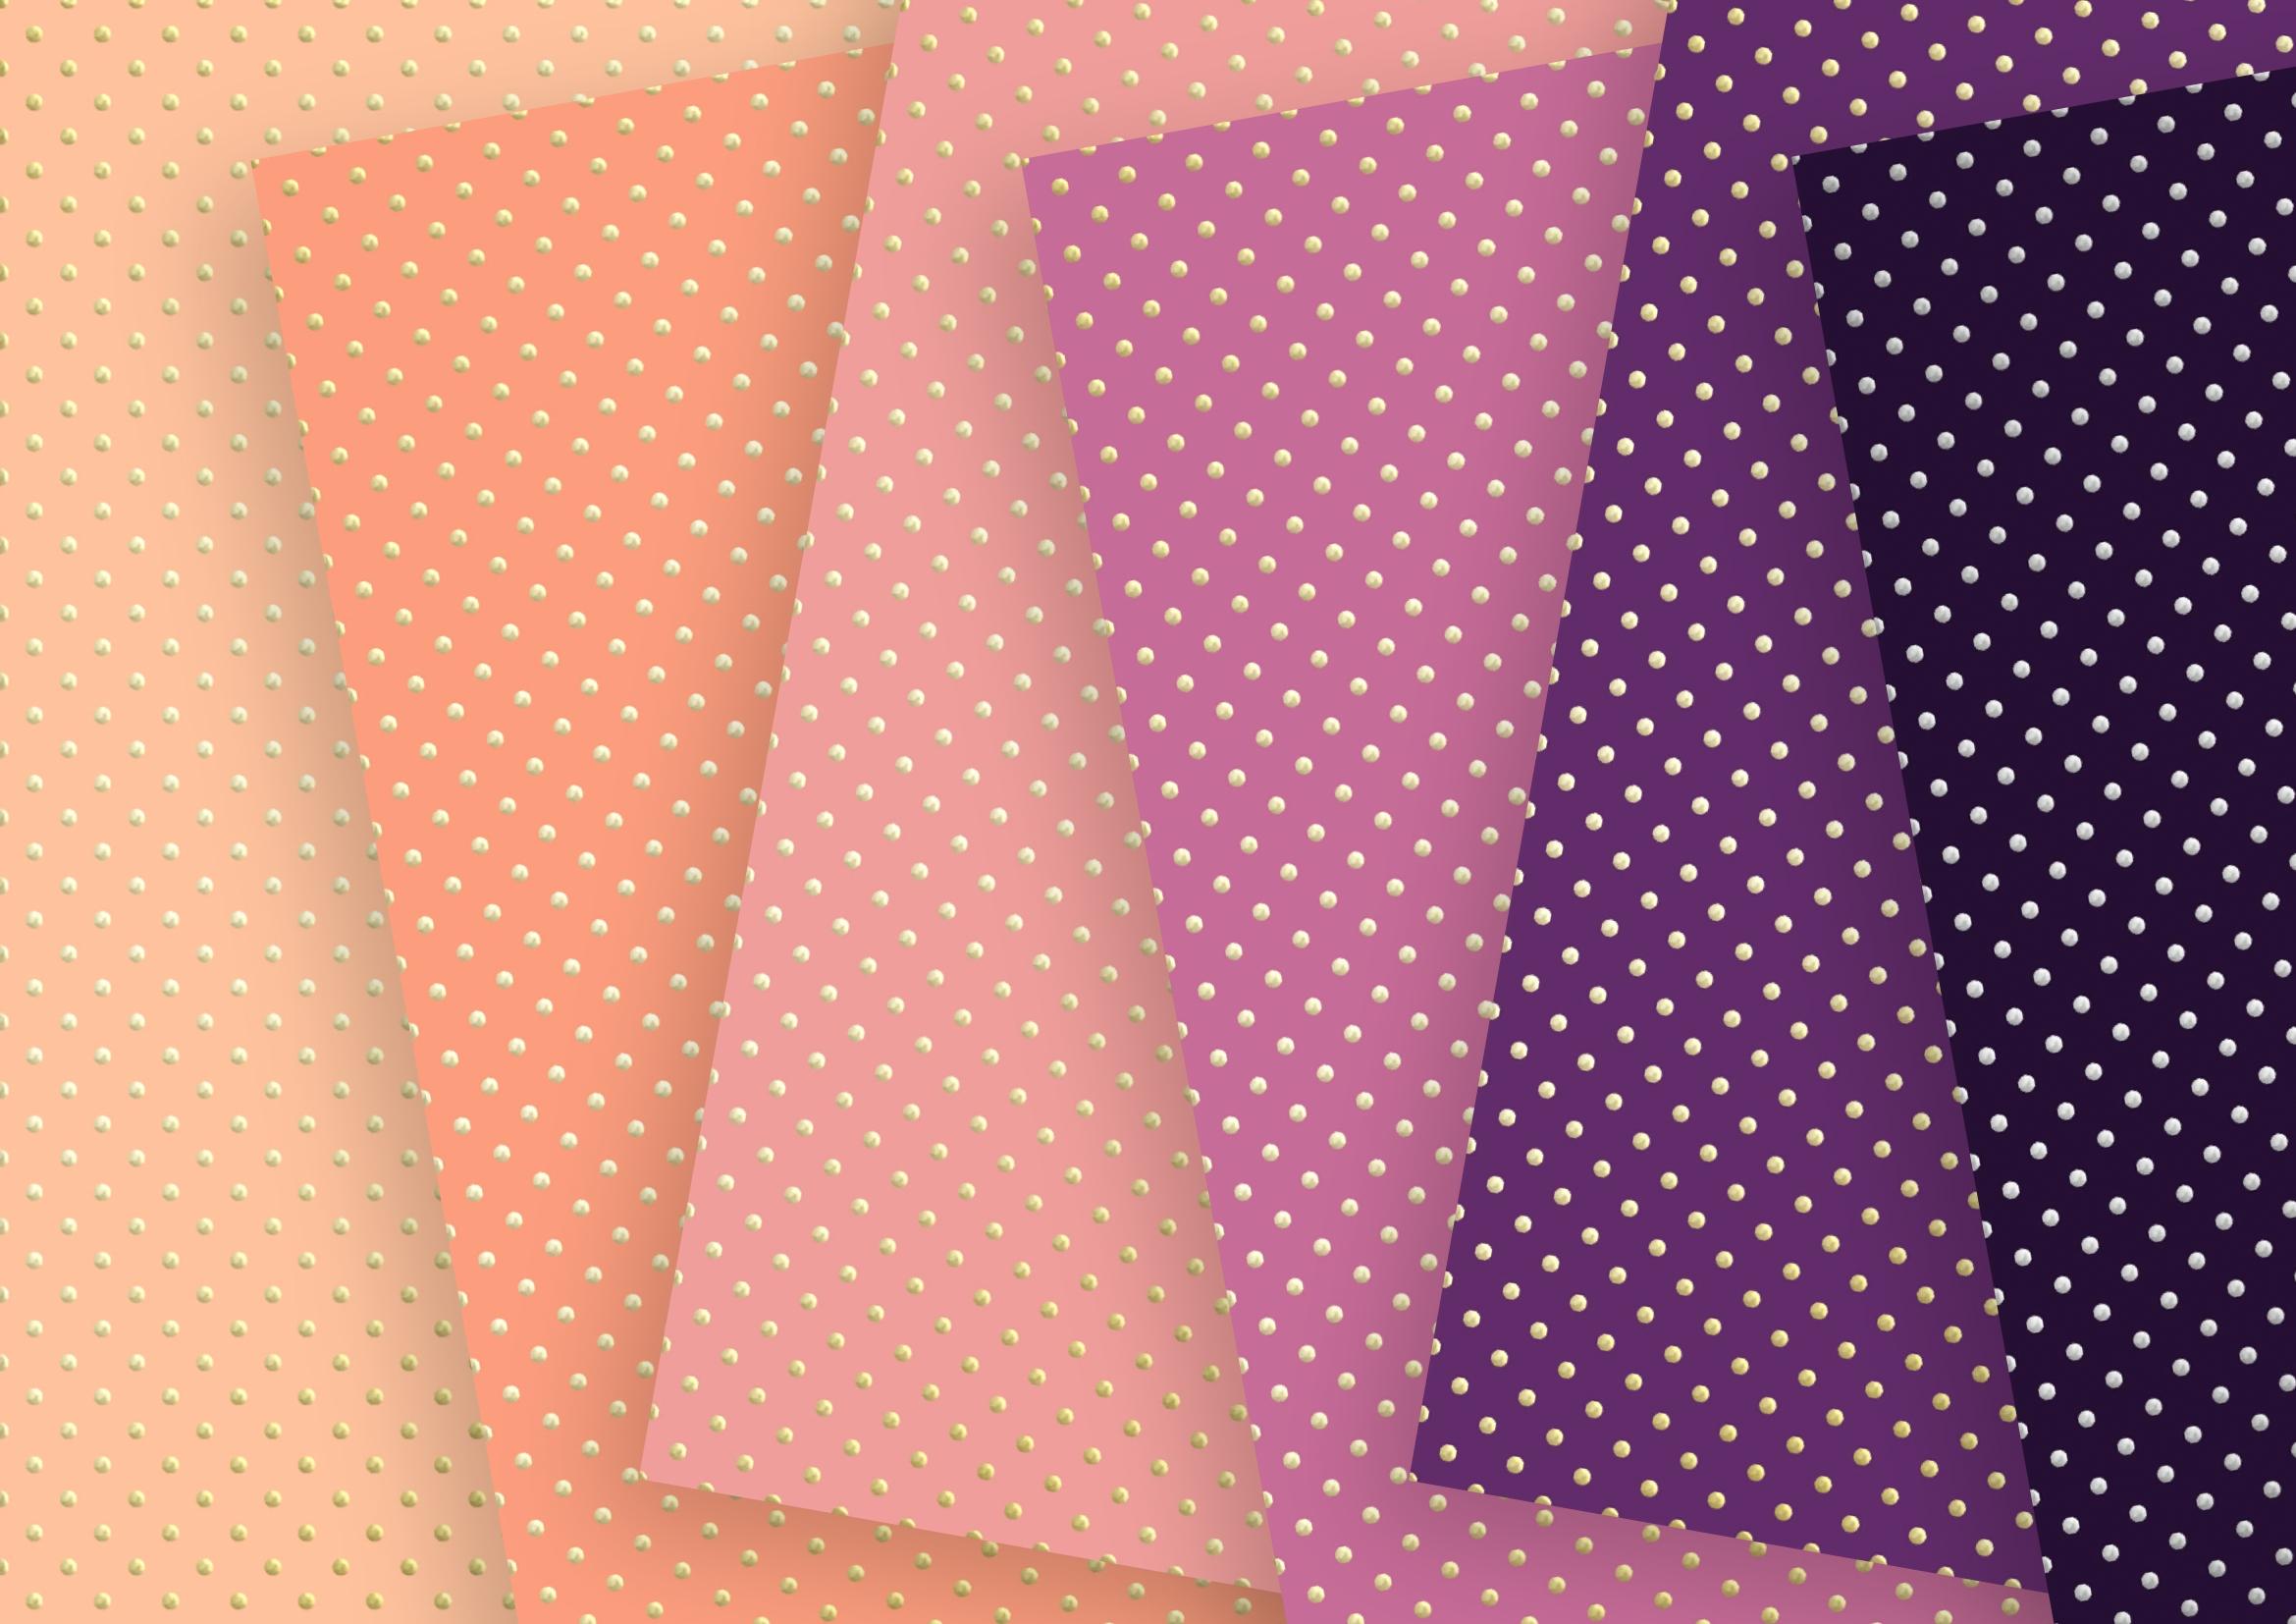 Twilight Soft Gold Digital Paper example image 2